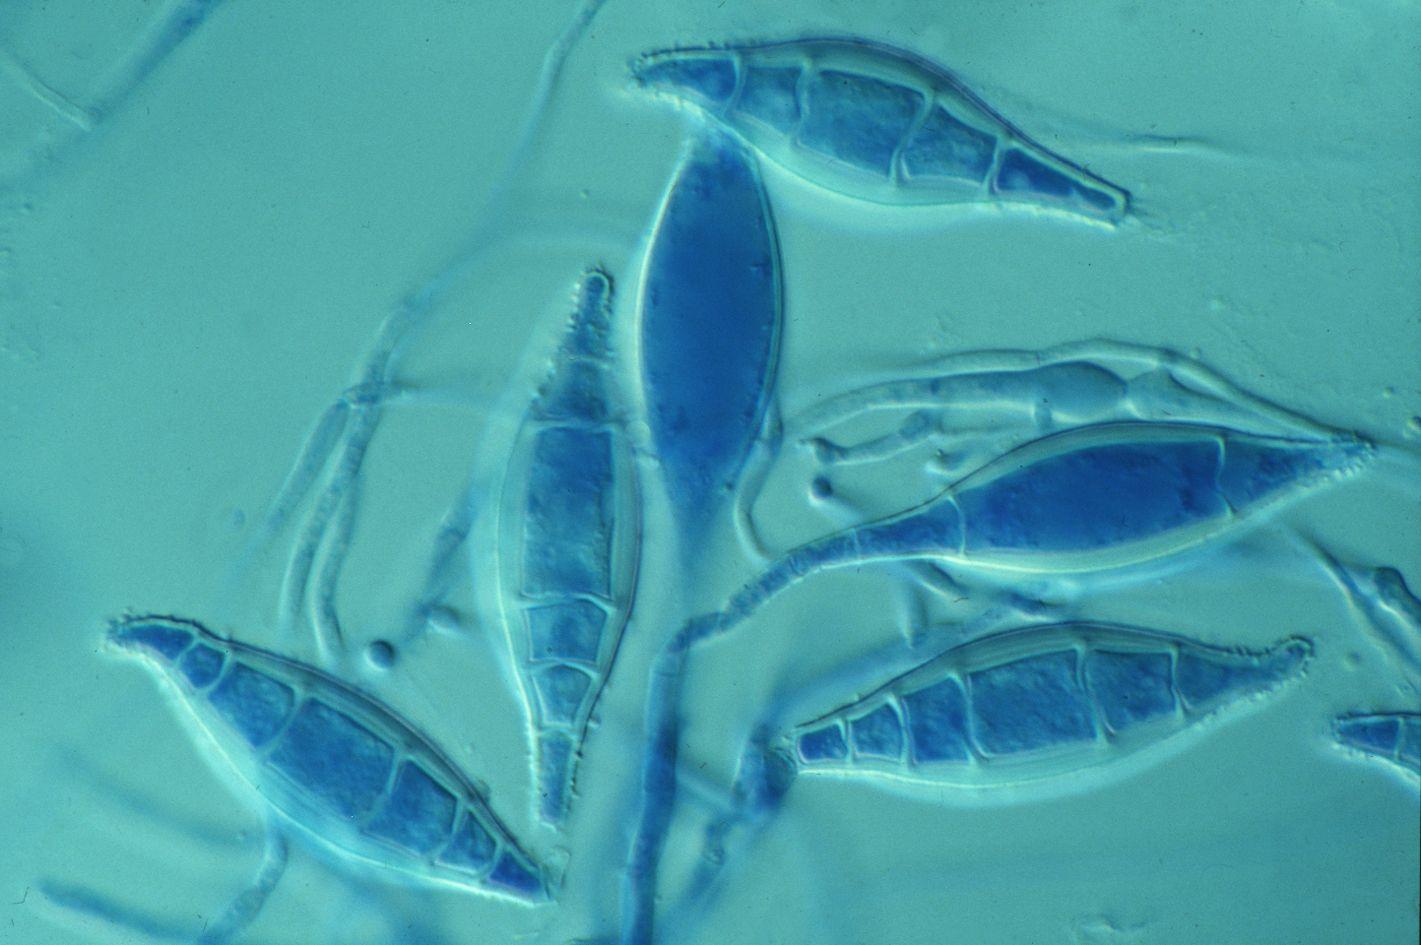 Pilze und Kulturpräparat von Microsporum canis